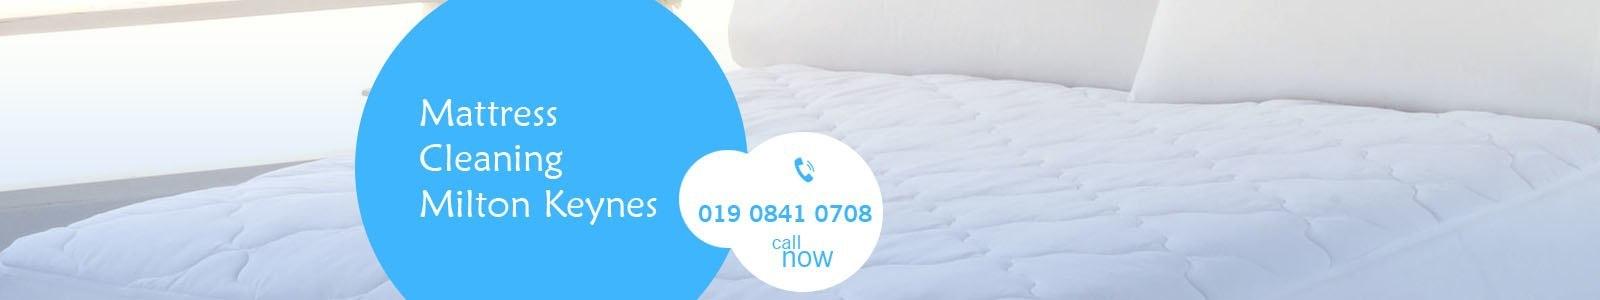 mattress-cleaning-milton-keynes